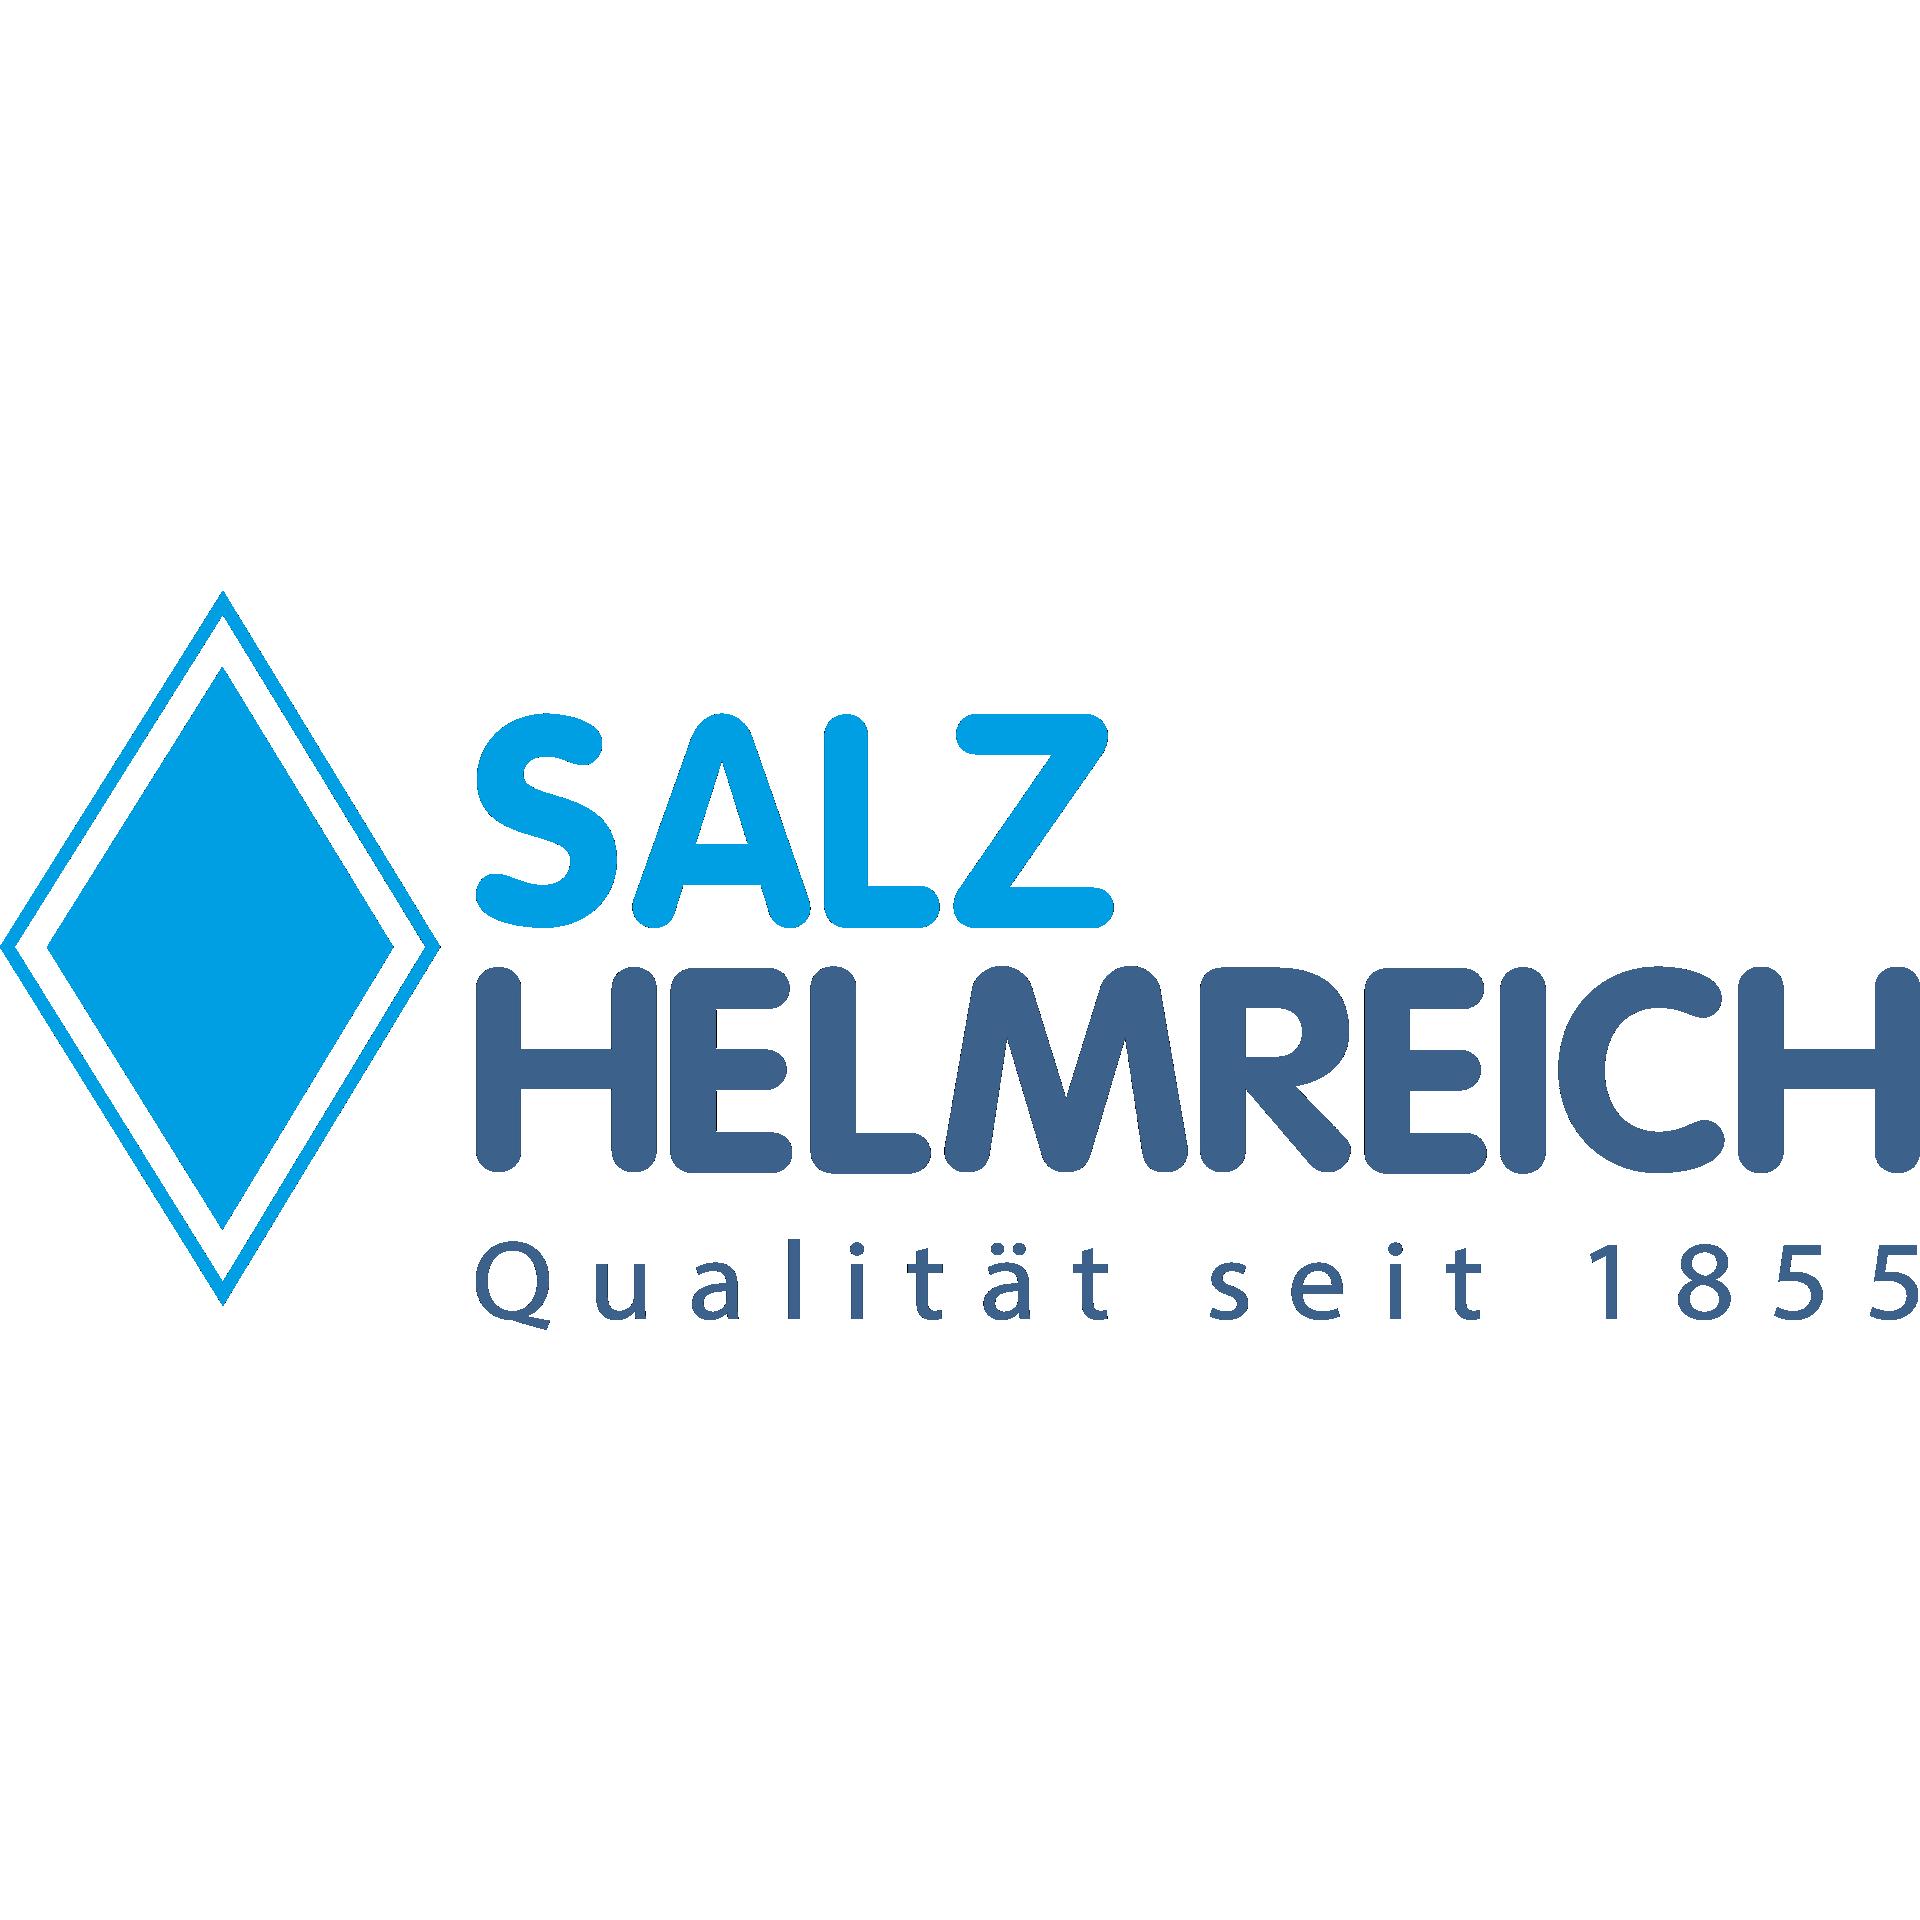 Notice: Undefined variable: sitename in /var/www/vhosts/salz-helmreich.de/httpdocs/modules/mod_codedesign_responsive_topseller/tmpl/default.php on line 64  Call Stack:     0,0002     648984   1. {main}() /var/www/vhosts/salz-helmreich.de/httpdocs/index.php:0     0,3805   13202064   2. JSite->render() /var/www/vhosts/salz-helmreich.de/httpdocs/index.php:50     0,3988   13846352   3. JDocumentHTML->render() /var/www/vhosts/salz-helmreich.de/httpdocs/includes/application.php:268     0,3988   13846352   4. JDocumentHTML->_renderTemplate() /var/www/vhosts/salz-helmreich.de/httpdocs/libraries/joomla/document/html/html.php:433     1,6689   15234312   5. JDocumentHTML->getBuffer() /var/www/vhosts/salz-helmreich.de/httpdocs/libraries/joomla/document/html/html.php:652     1,6689   15234960   6. JDocumentRendererModules->render() /var/www/vhosts/salz-helmreich.de/httpdocs/libraries/joomla/document/html/html.php:371     1,6690   15235992   7. JDocumentRendererModule->render() /var/www/vhosts/salz-helmreich.de/httpdocs/libraries/joomla/document/html/renderer/modules.php:39     1,6691   15238280   8. JModuleHelper::renderModule() /var/www/vhosts/salz-helmreich.de/httpdocs/libraries/joomla/document/html/renderer/module.php:107     1,6702   15322672   9. include('/var/www/vhosts/salz-helmreich.de/httpdocs/modules/mod_codedesign_responsive_topseller/mod_codedesign_responsive_topseller.php') /var/www/vhosts/salz-helmreich.de/httpdocs/libraries/joomla/application/module/helper.php:173     1,6758   15364144  10. require_once('/var/www/vhosts/salz-helmreich.de/httpdocs/modules/mod_codedesign_responsive_topseller/tmpl/default.php') /var/www/vhosts/salz-helmreich.de/httpdocs/modules/mod_codedesign_responsive_topseller/mod_codedesign_responsive_topseller.php:86